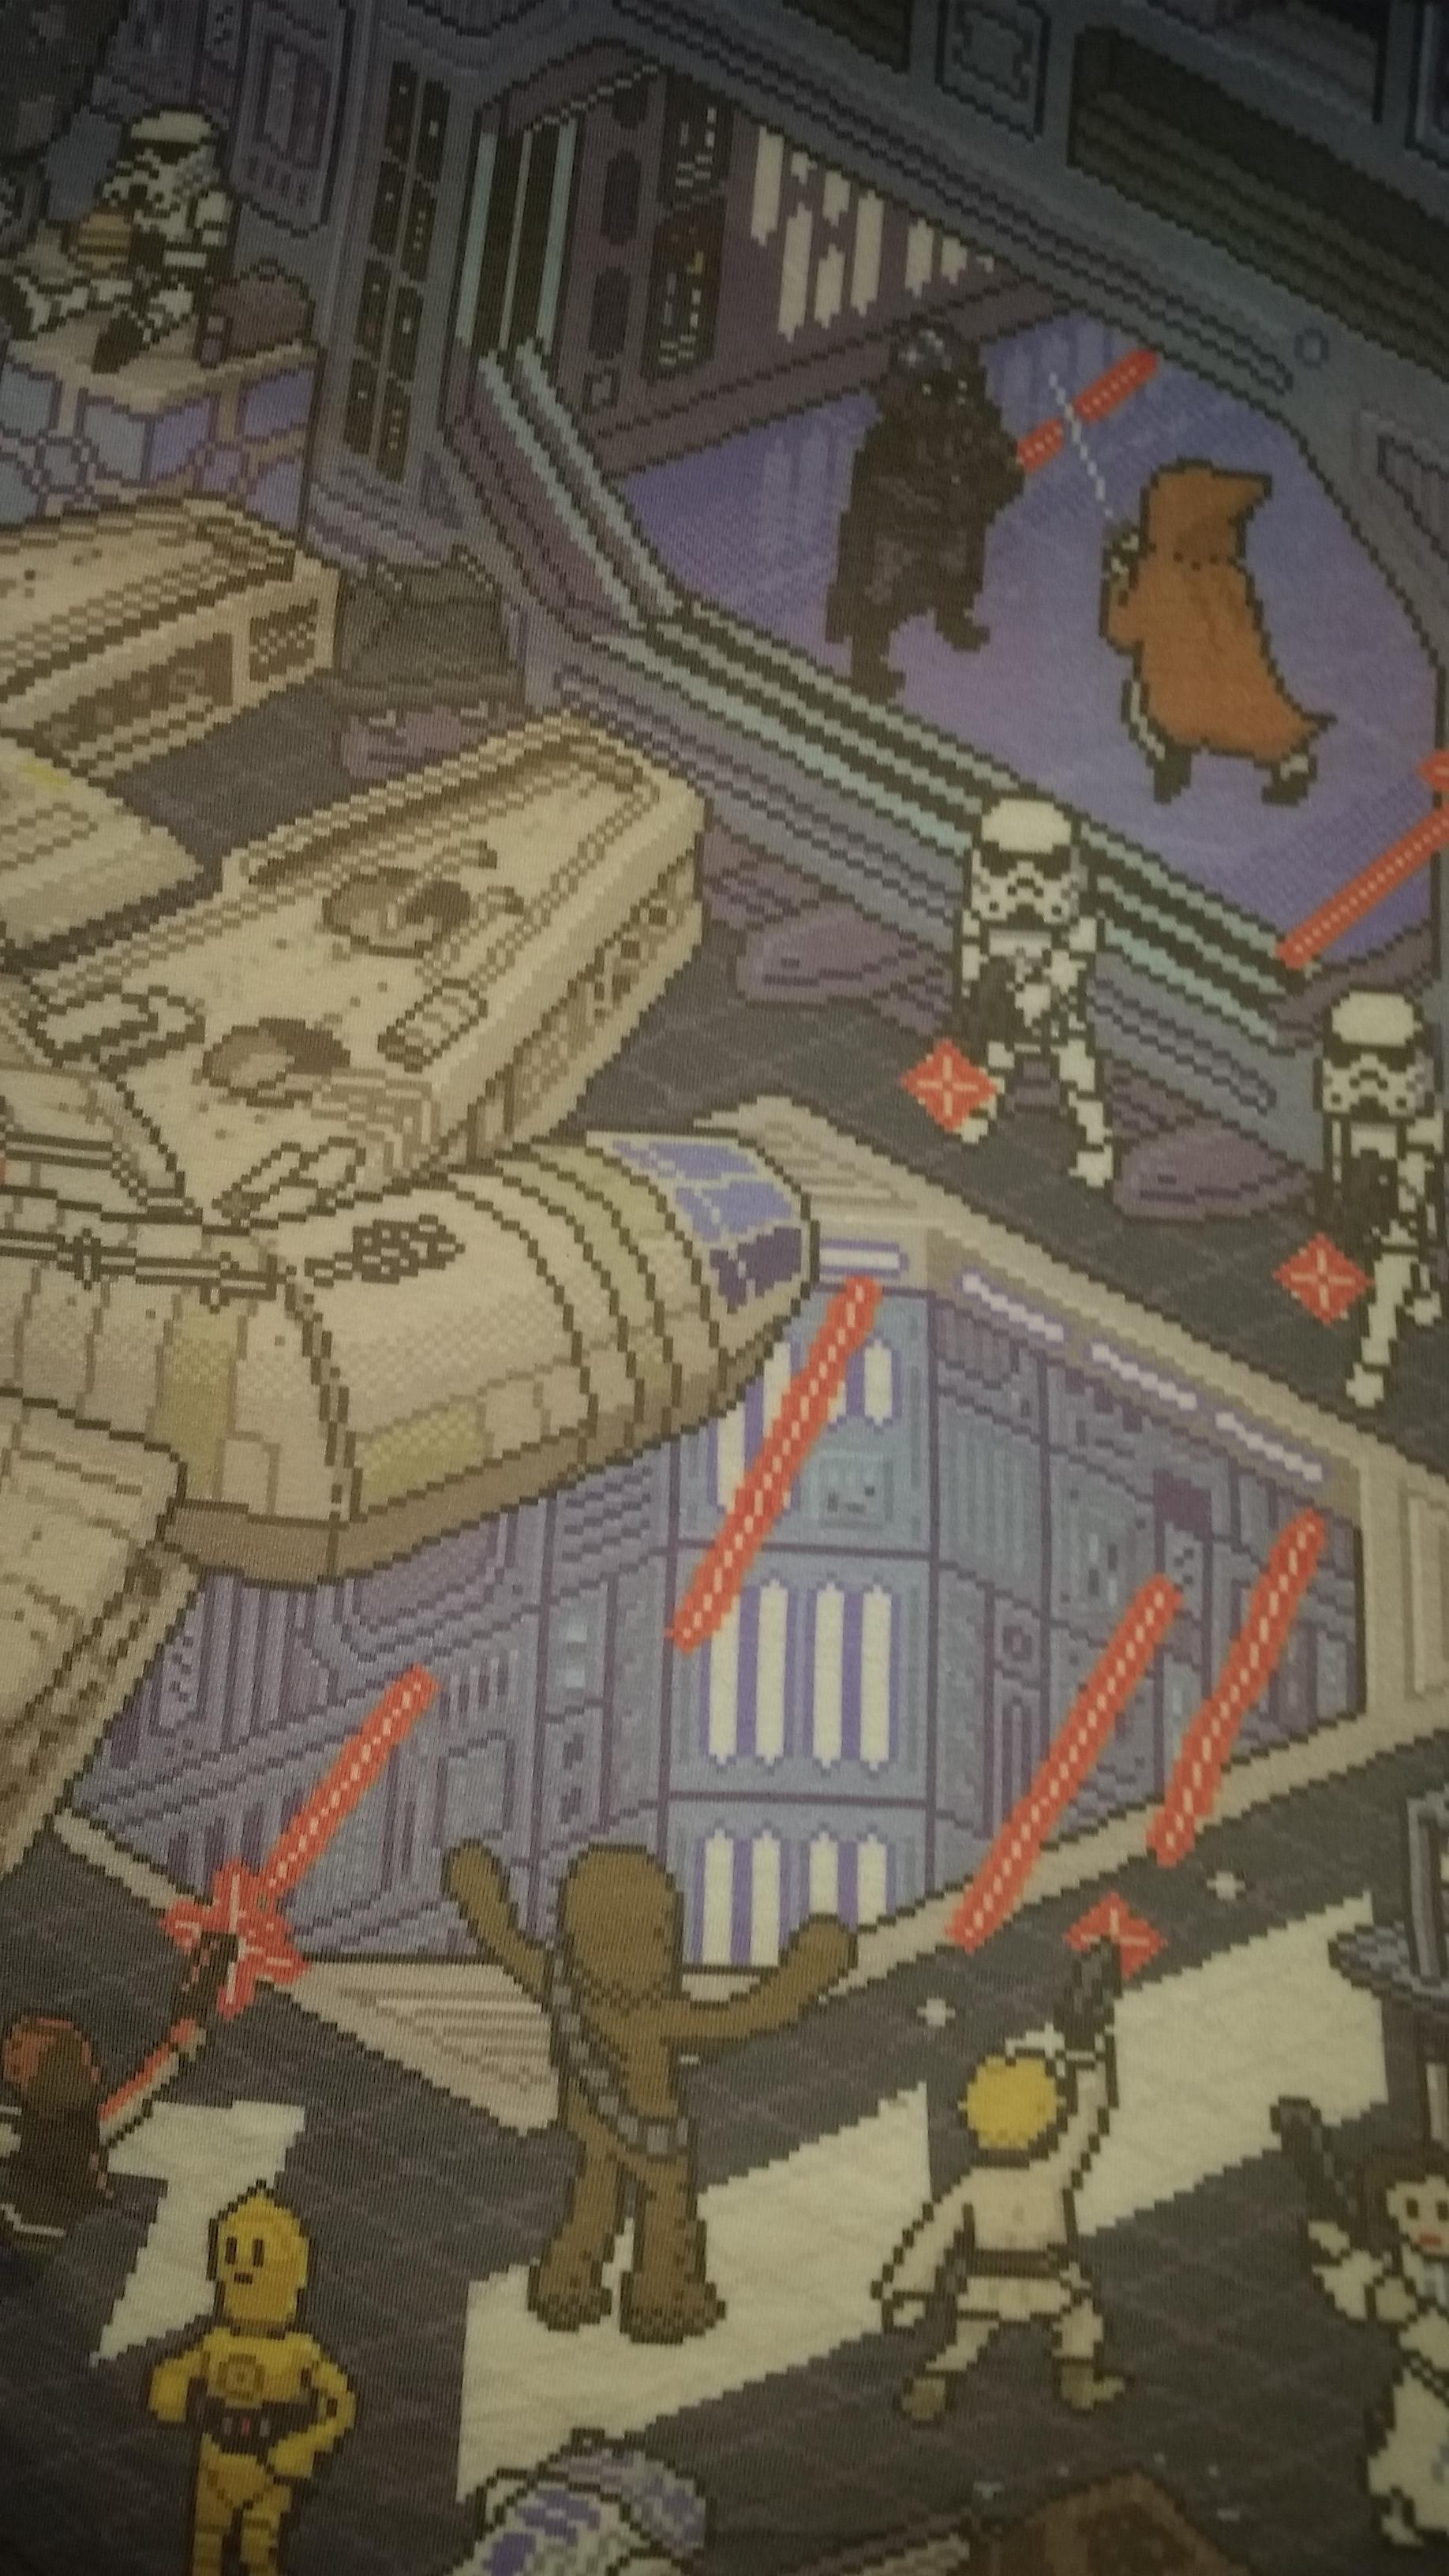 16-bit phone wallpaper. Vader vs.